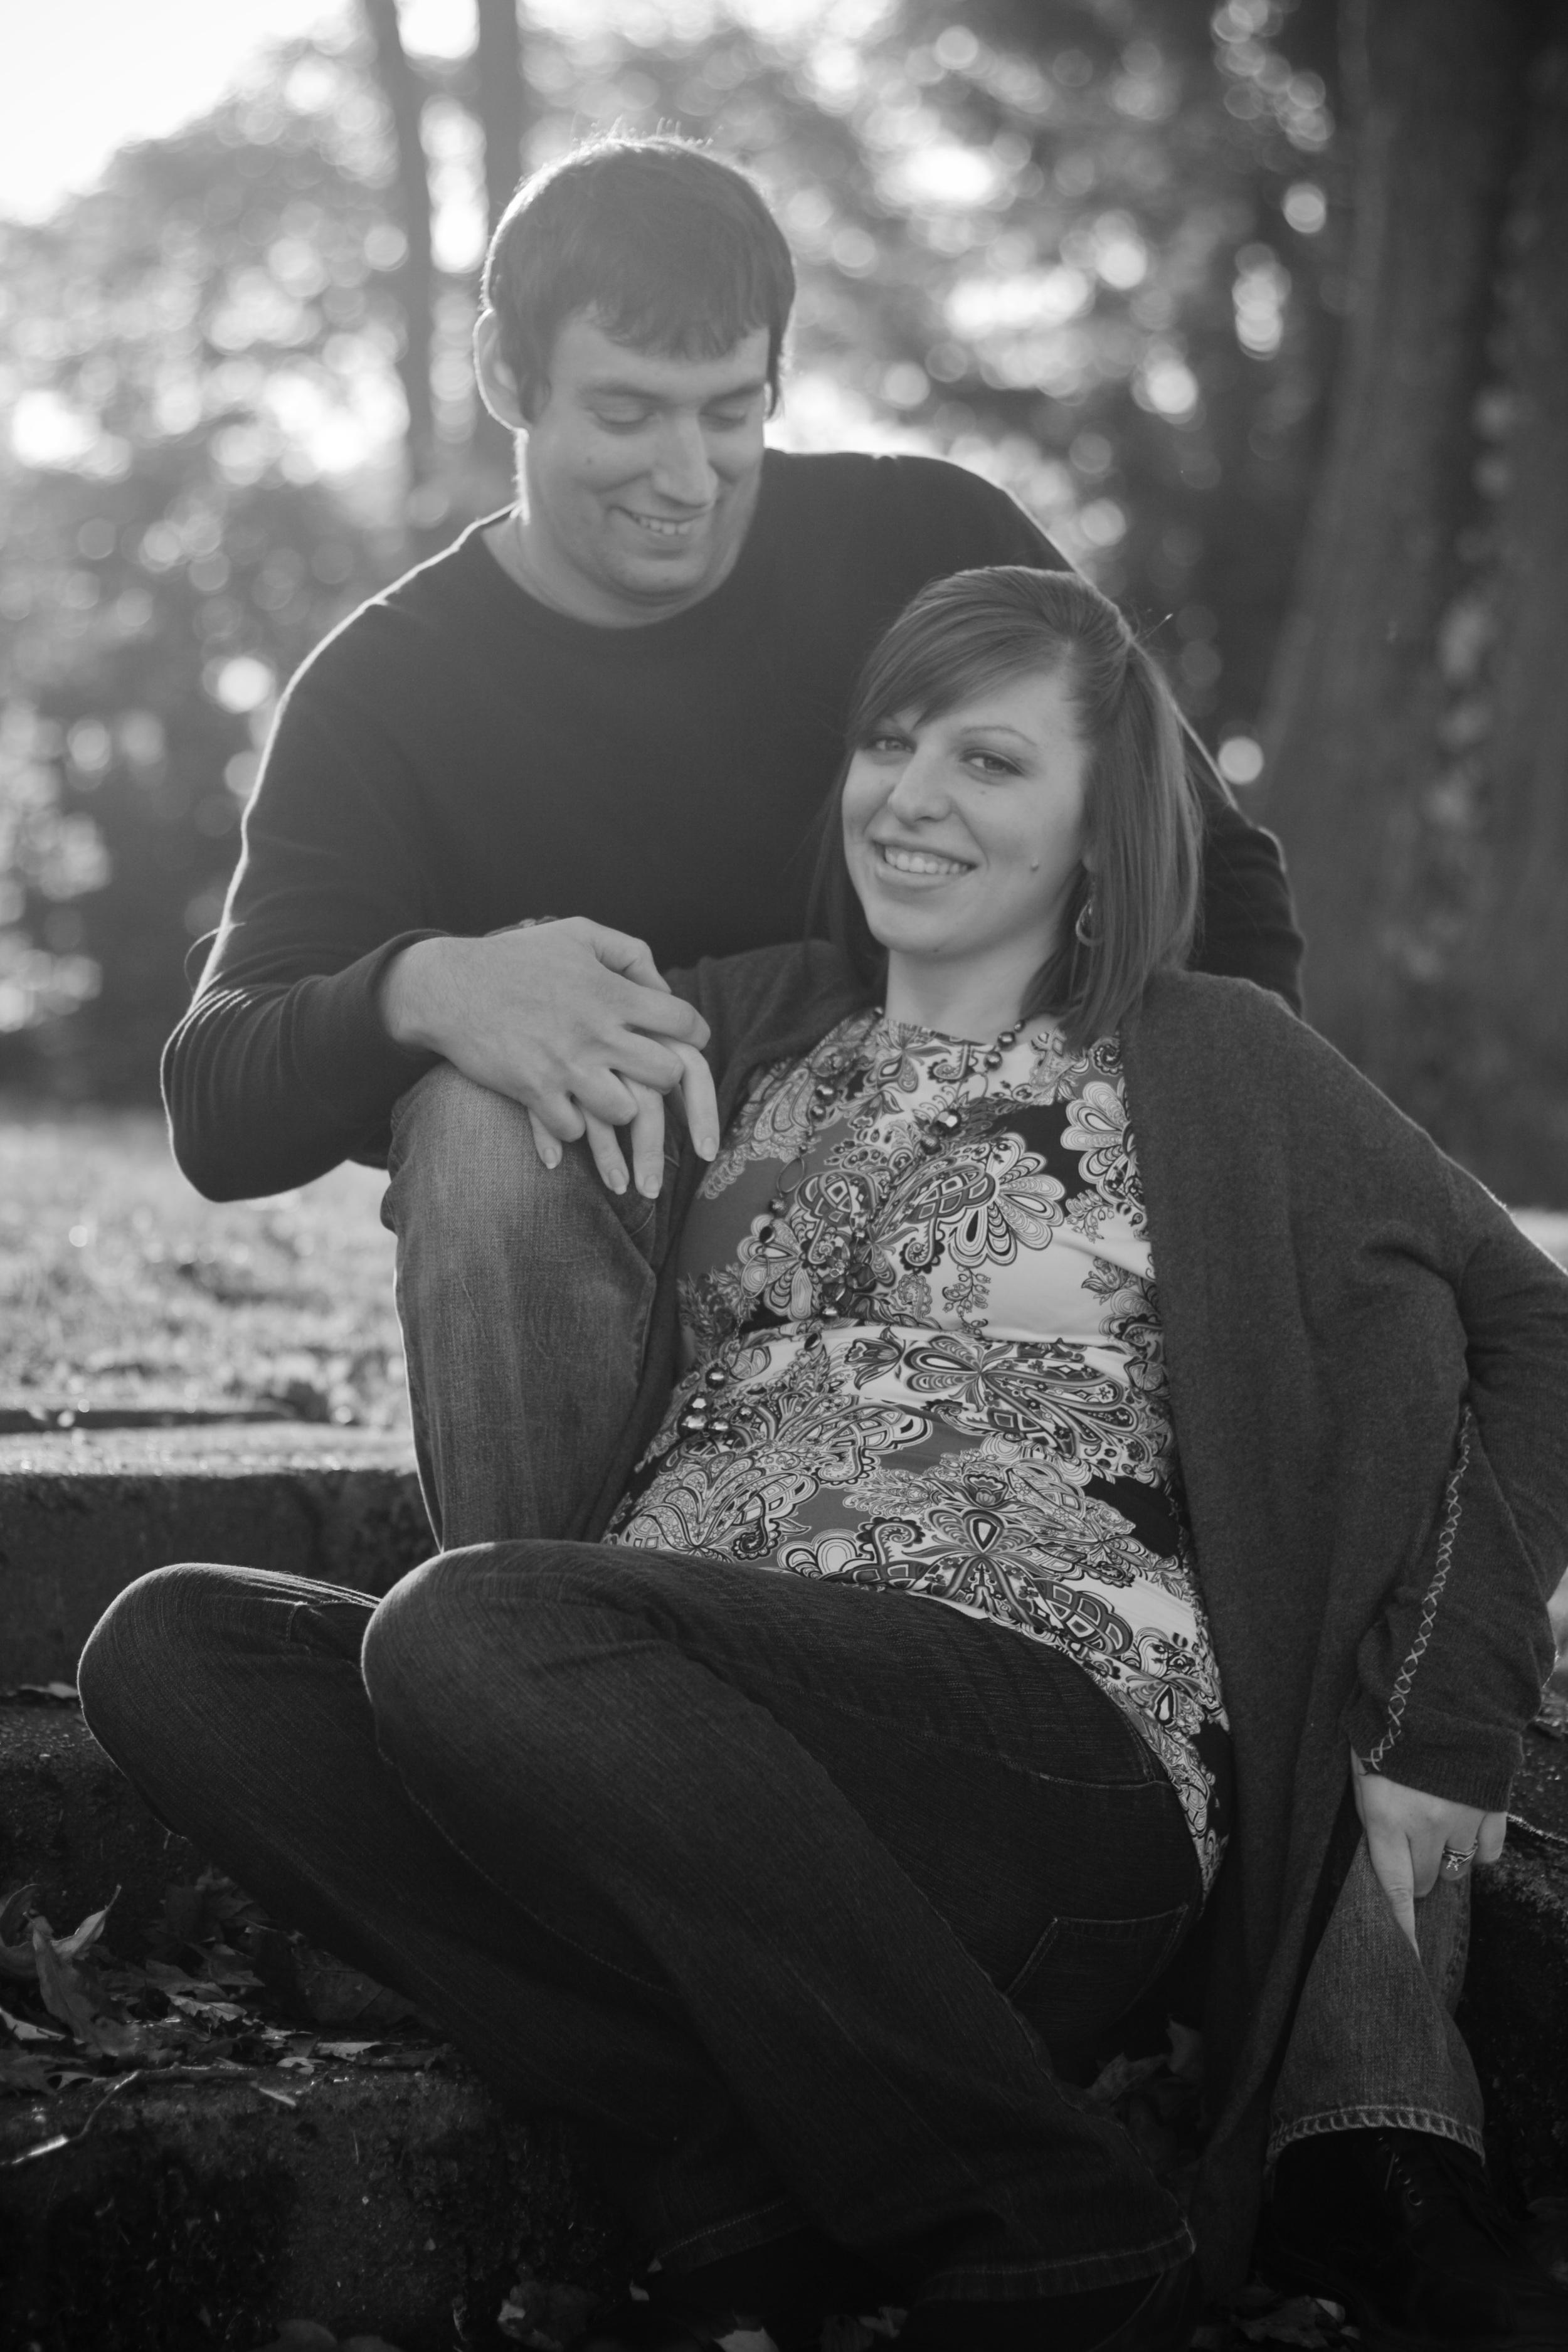 Ryan and Melissa